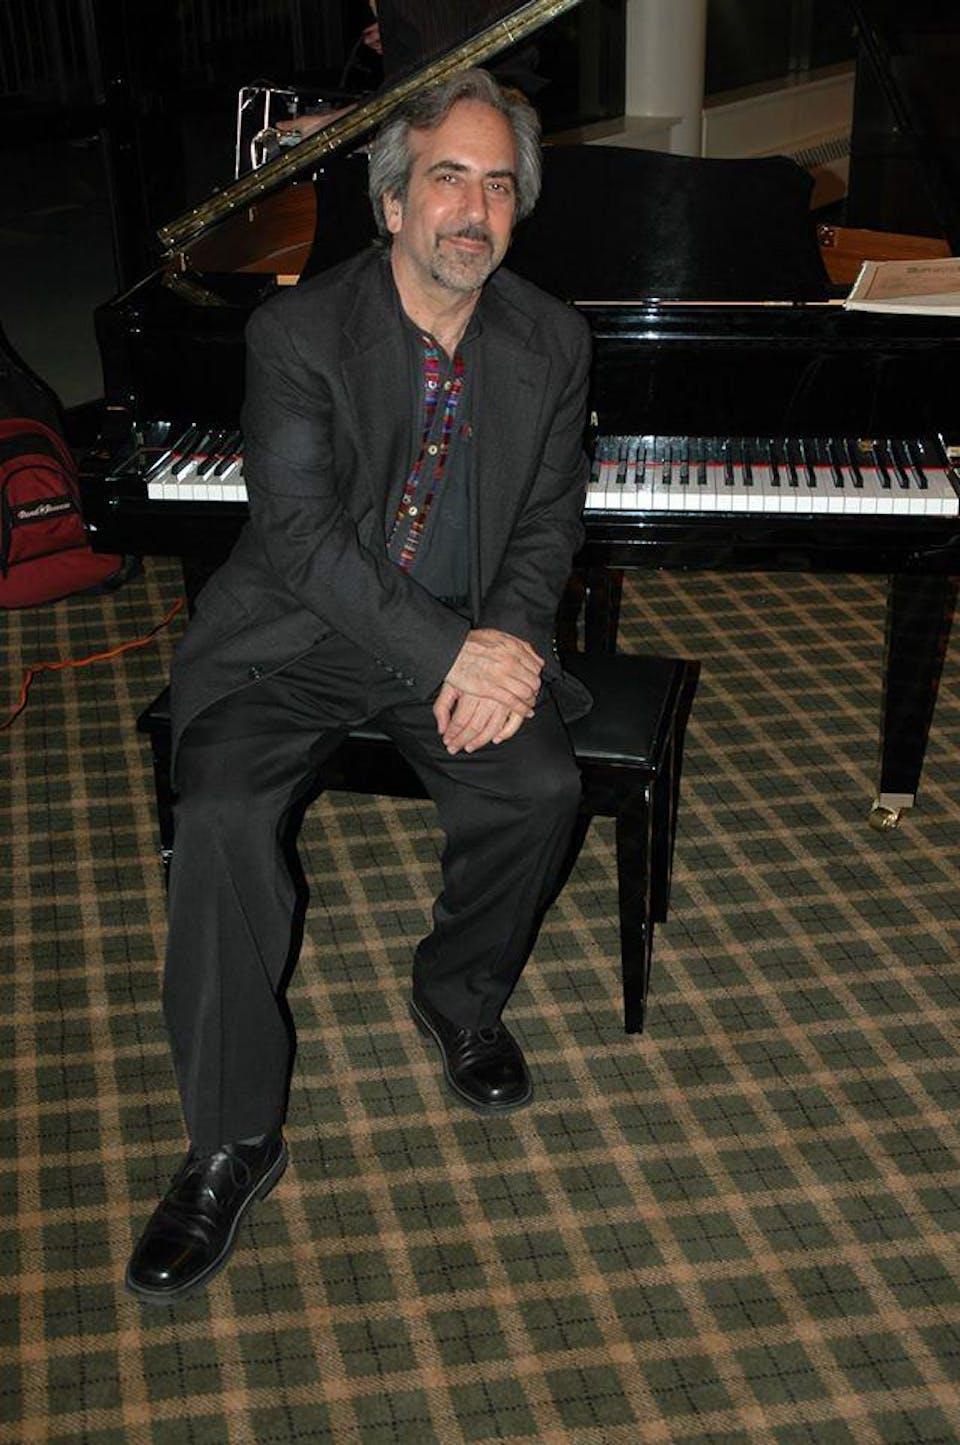 Rob Silverman